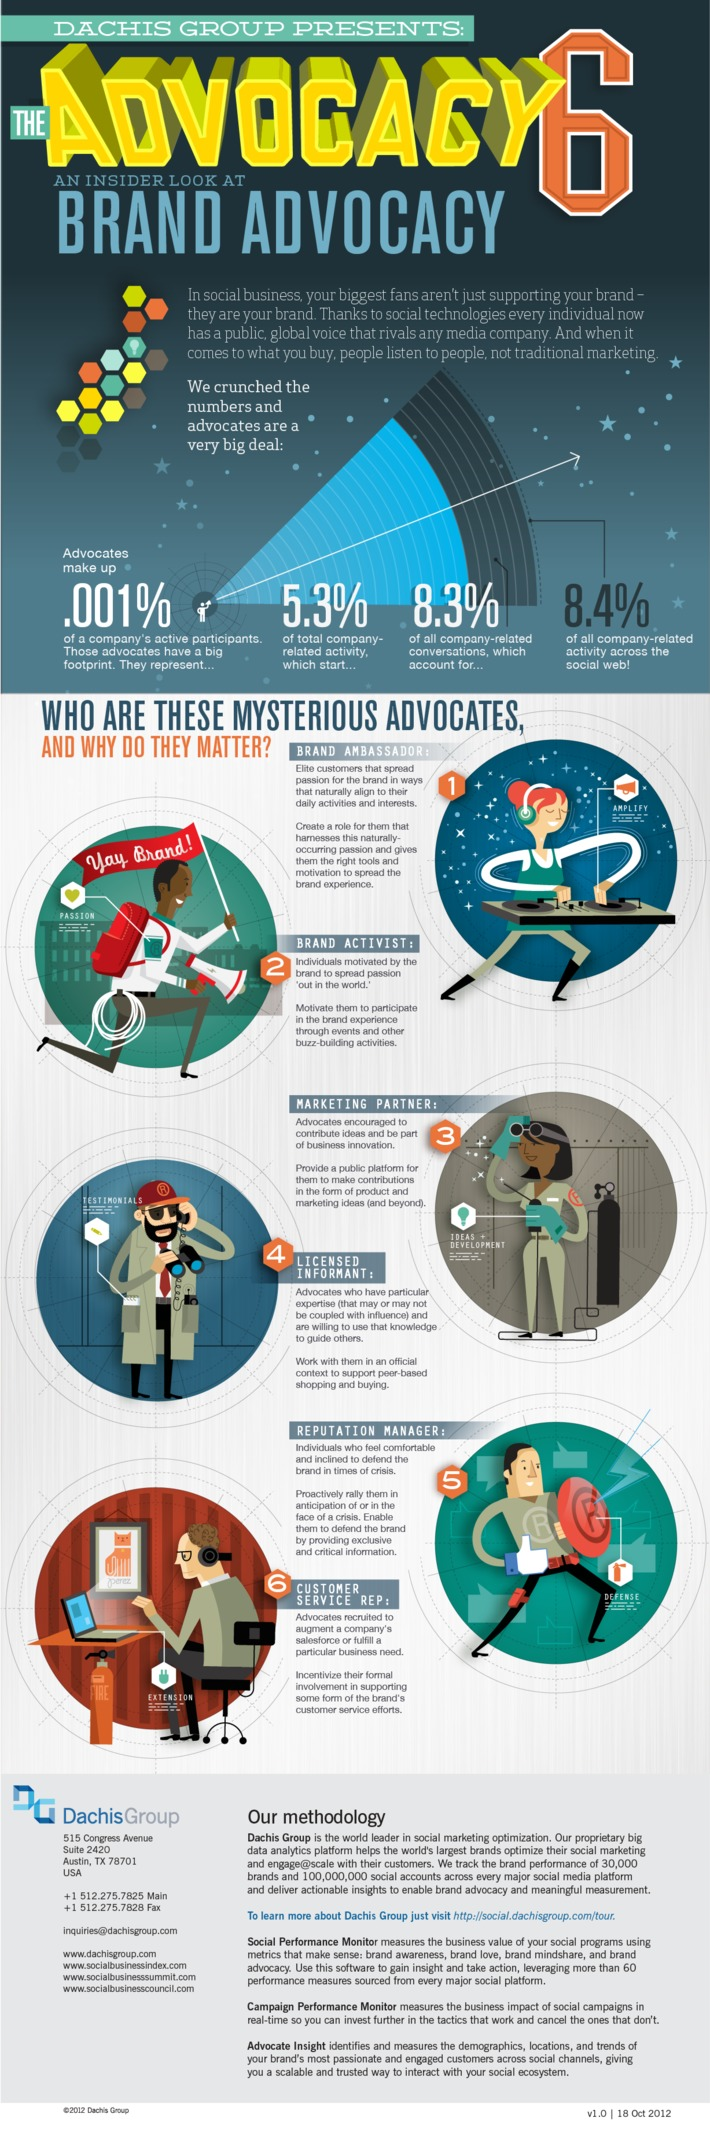 Six Brand Advocate Archetypes | A Marketing Mix | Scoop.it